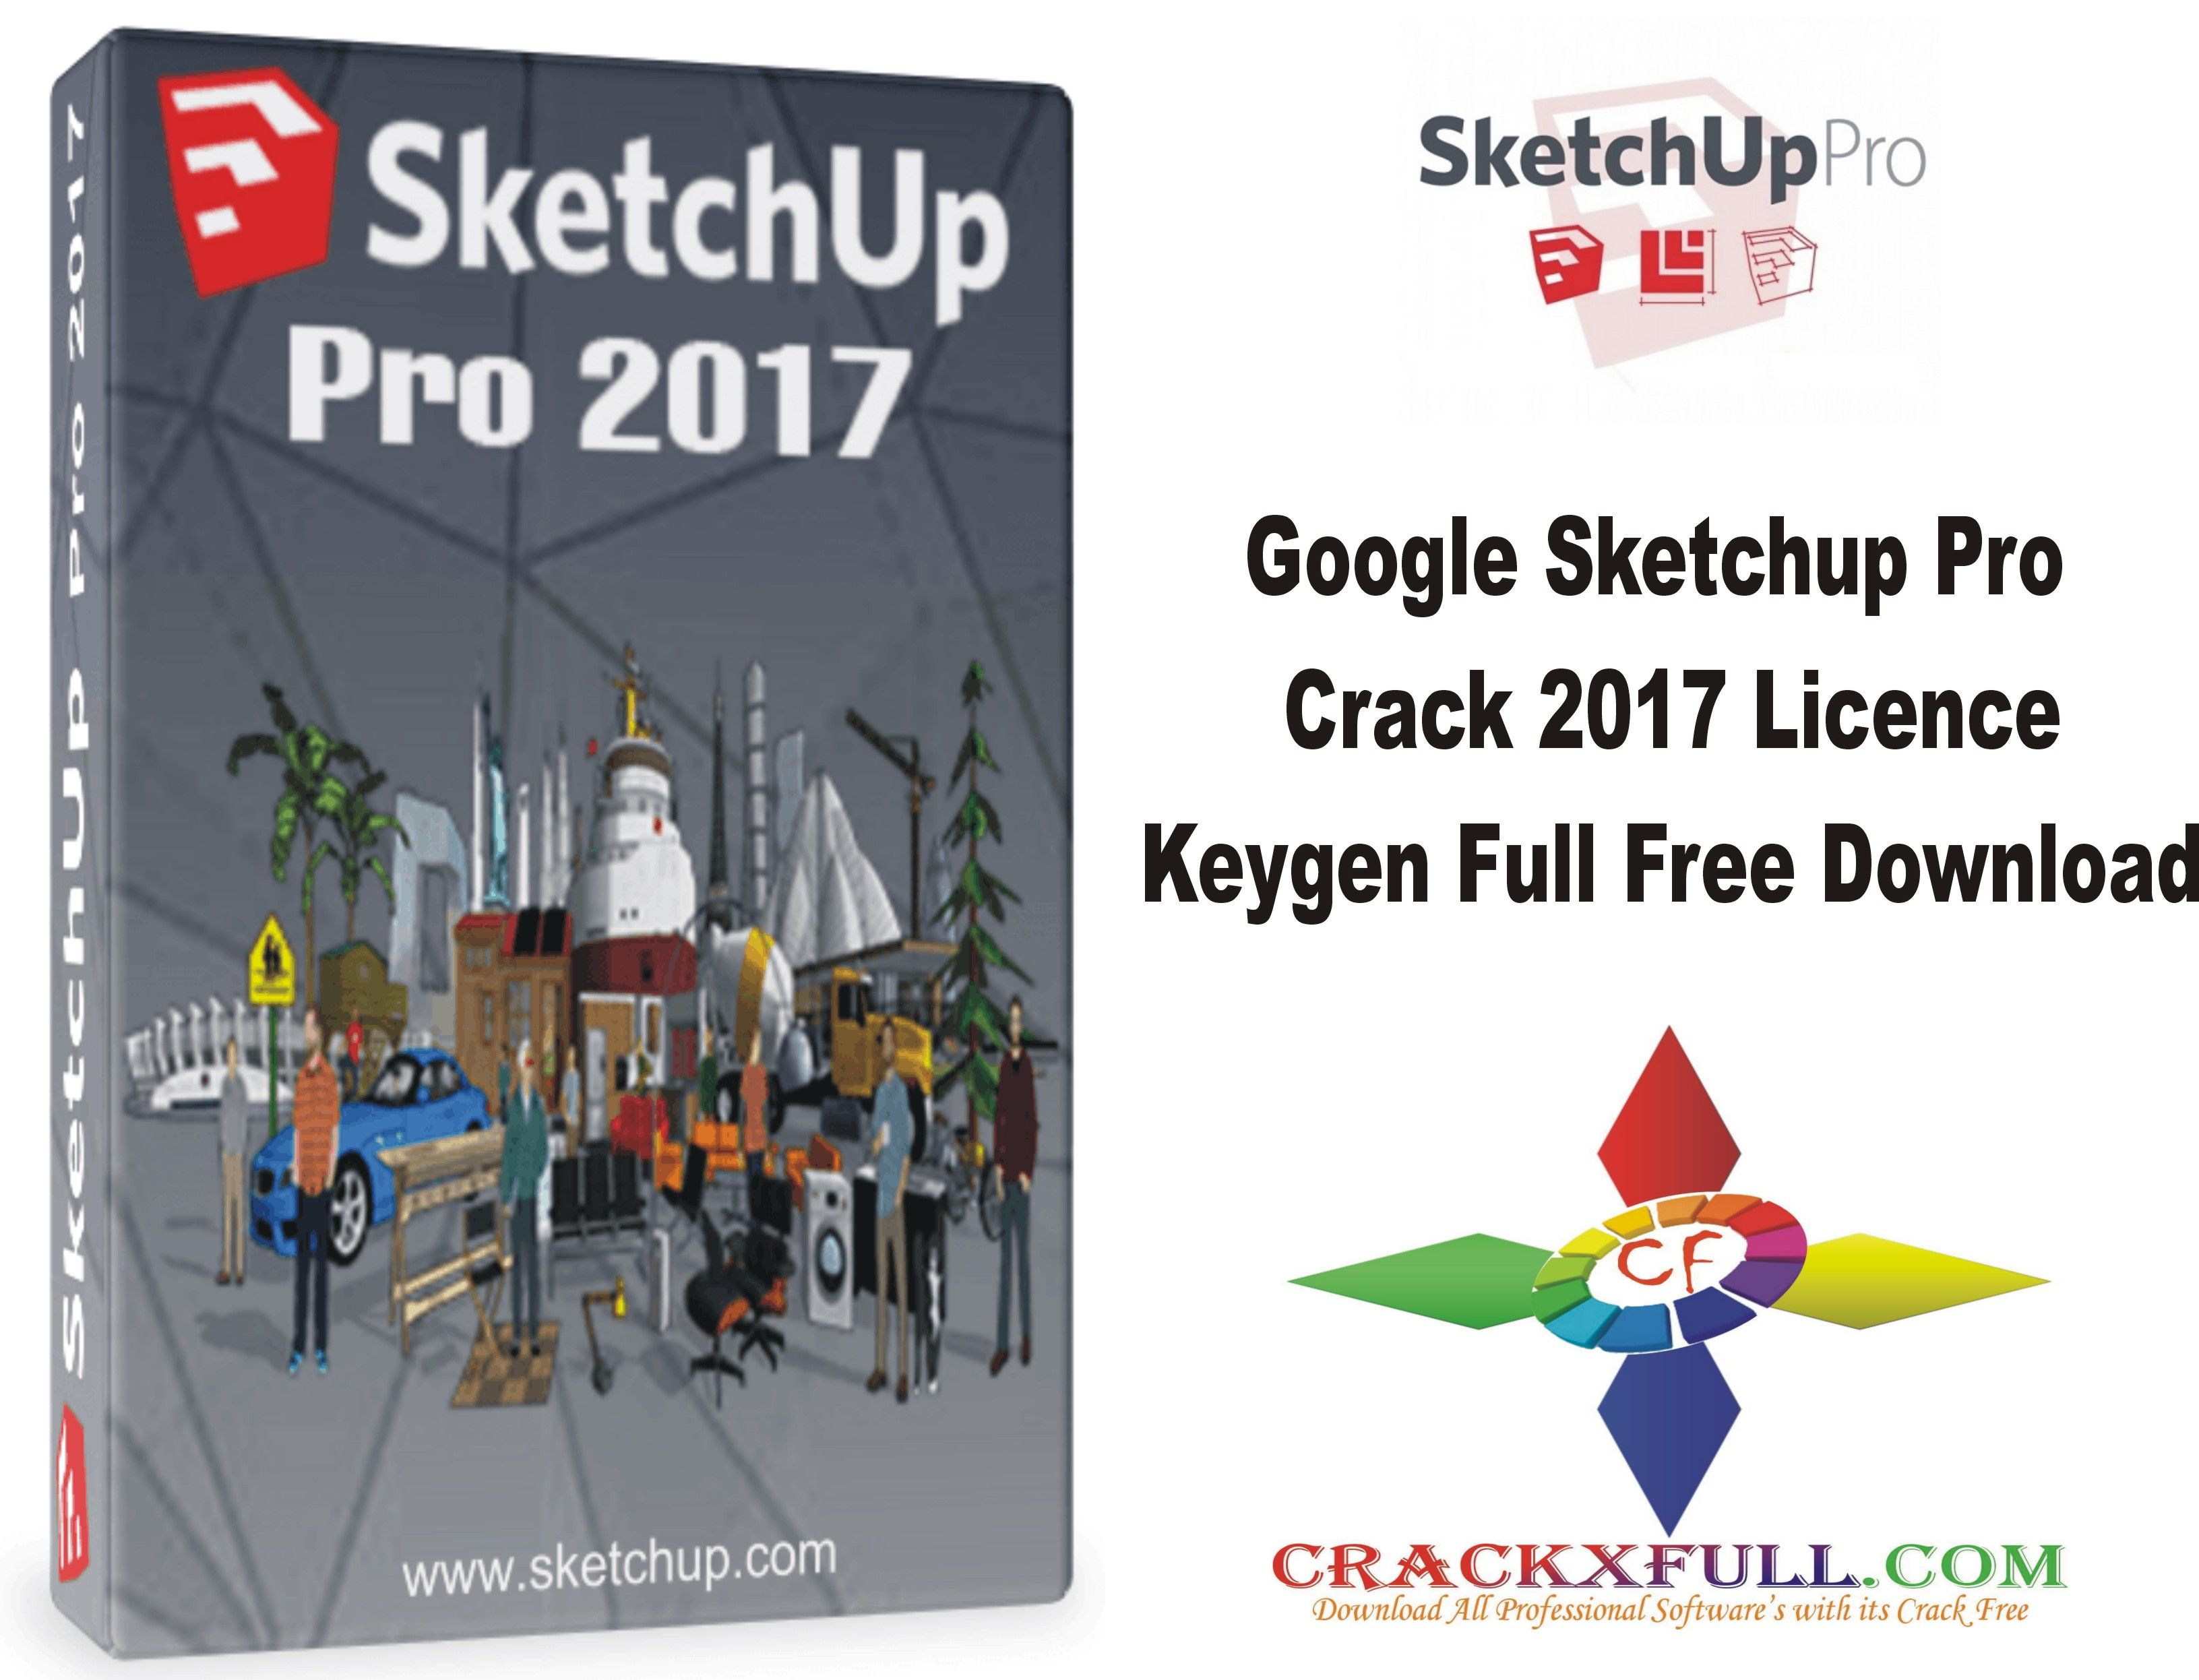 Sketchup pro 2017 v13.0.3689 patch